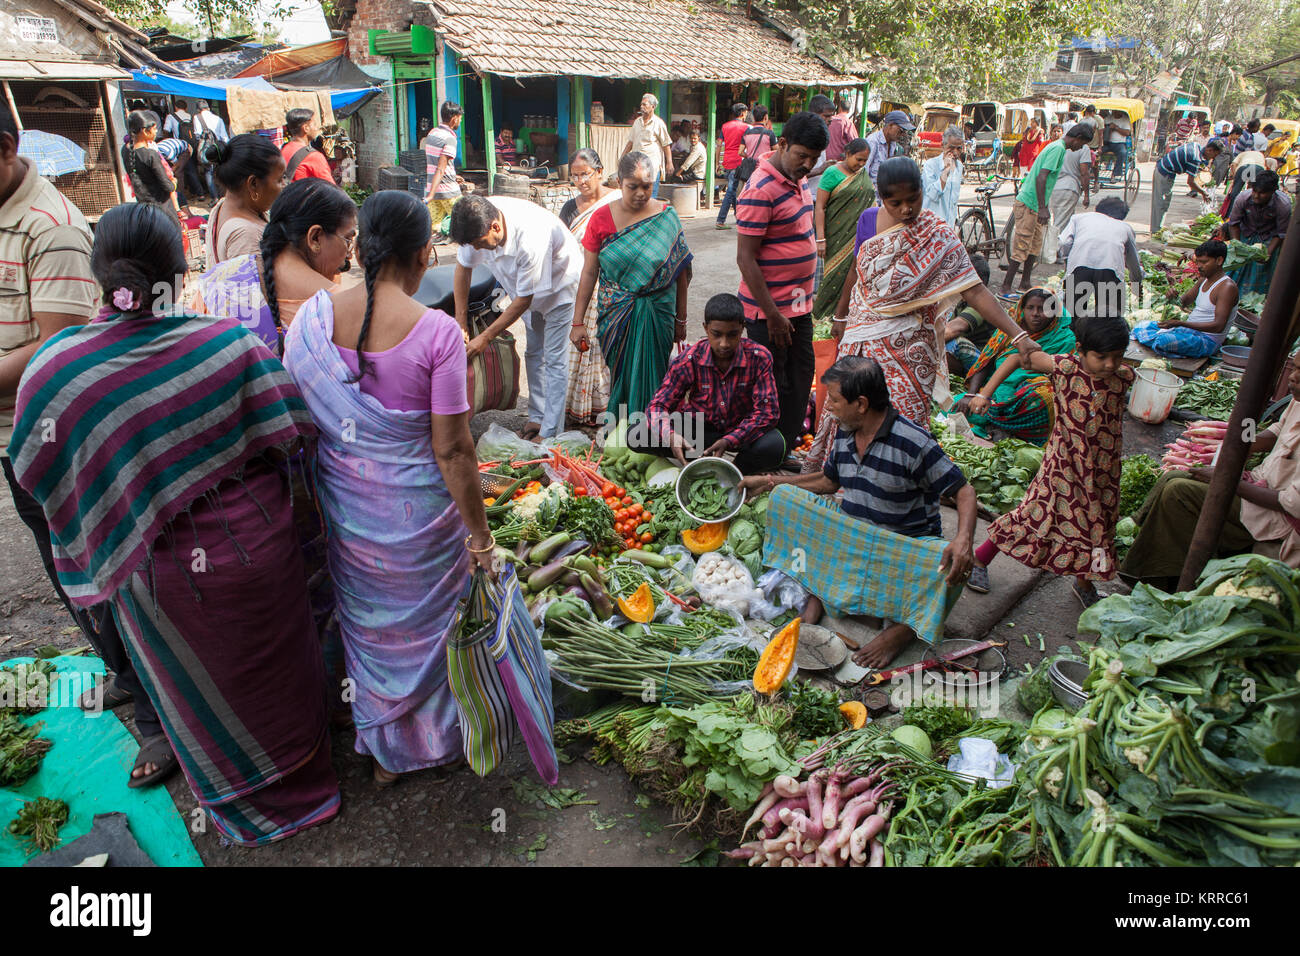 Vegetable market in the Garia district of Kolkata, India - Stock Image